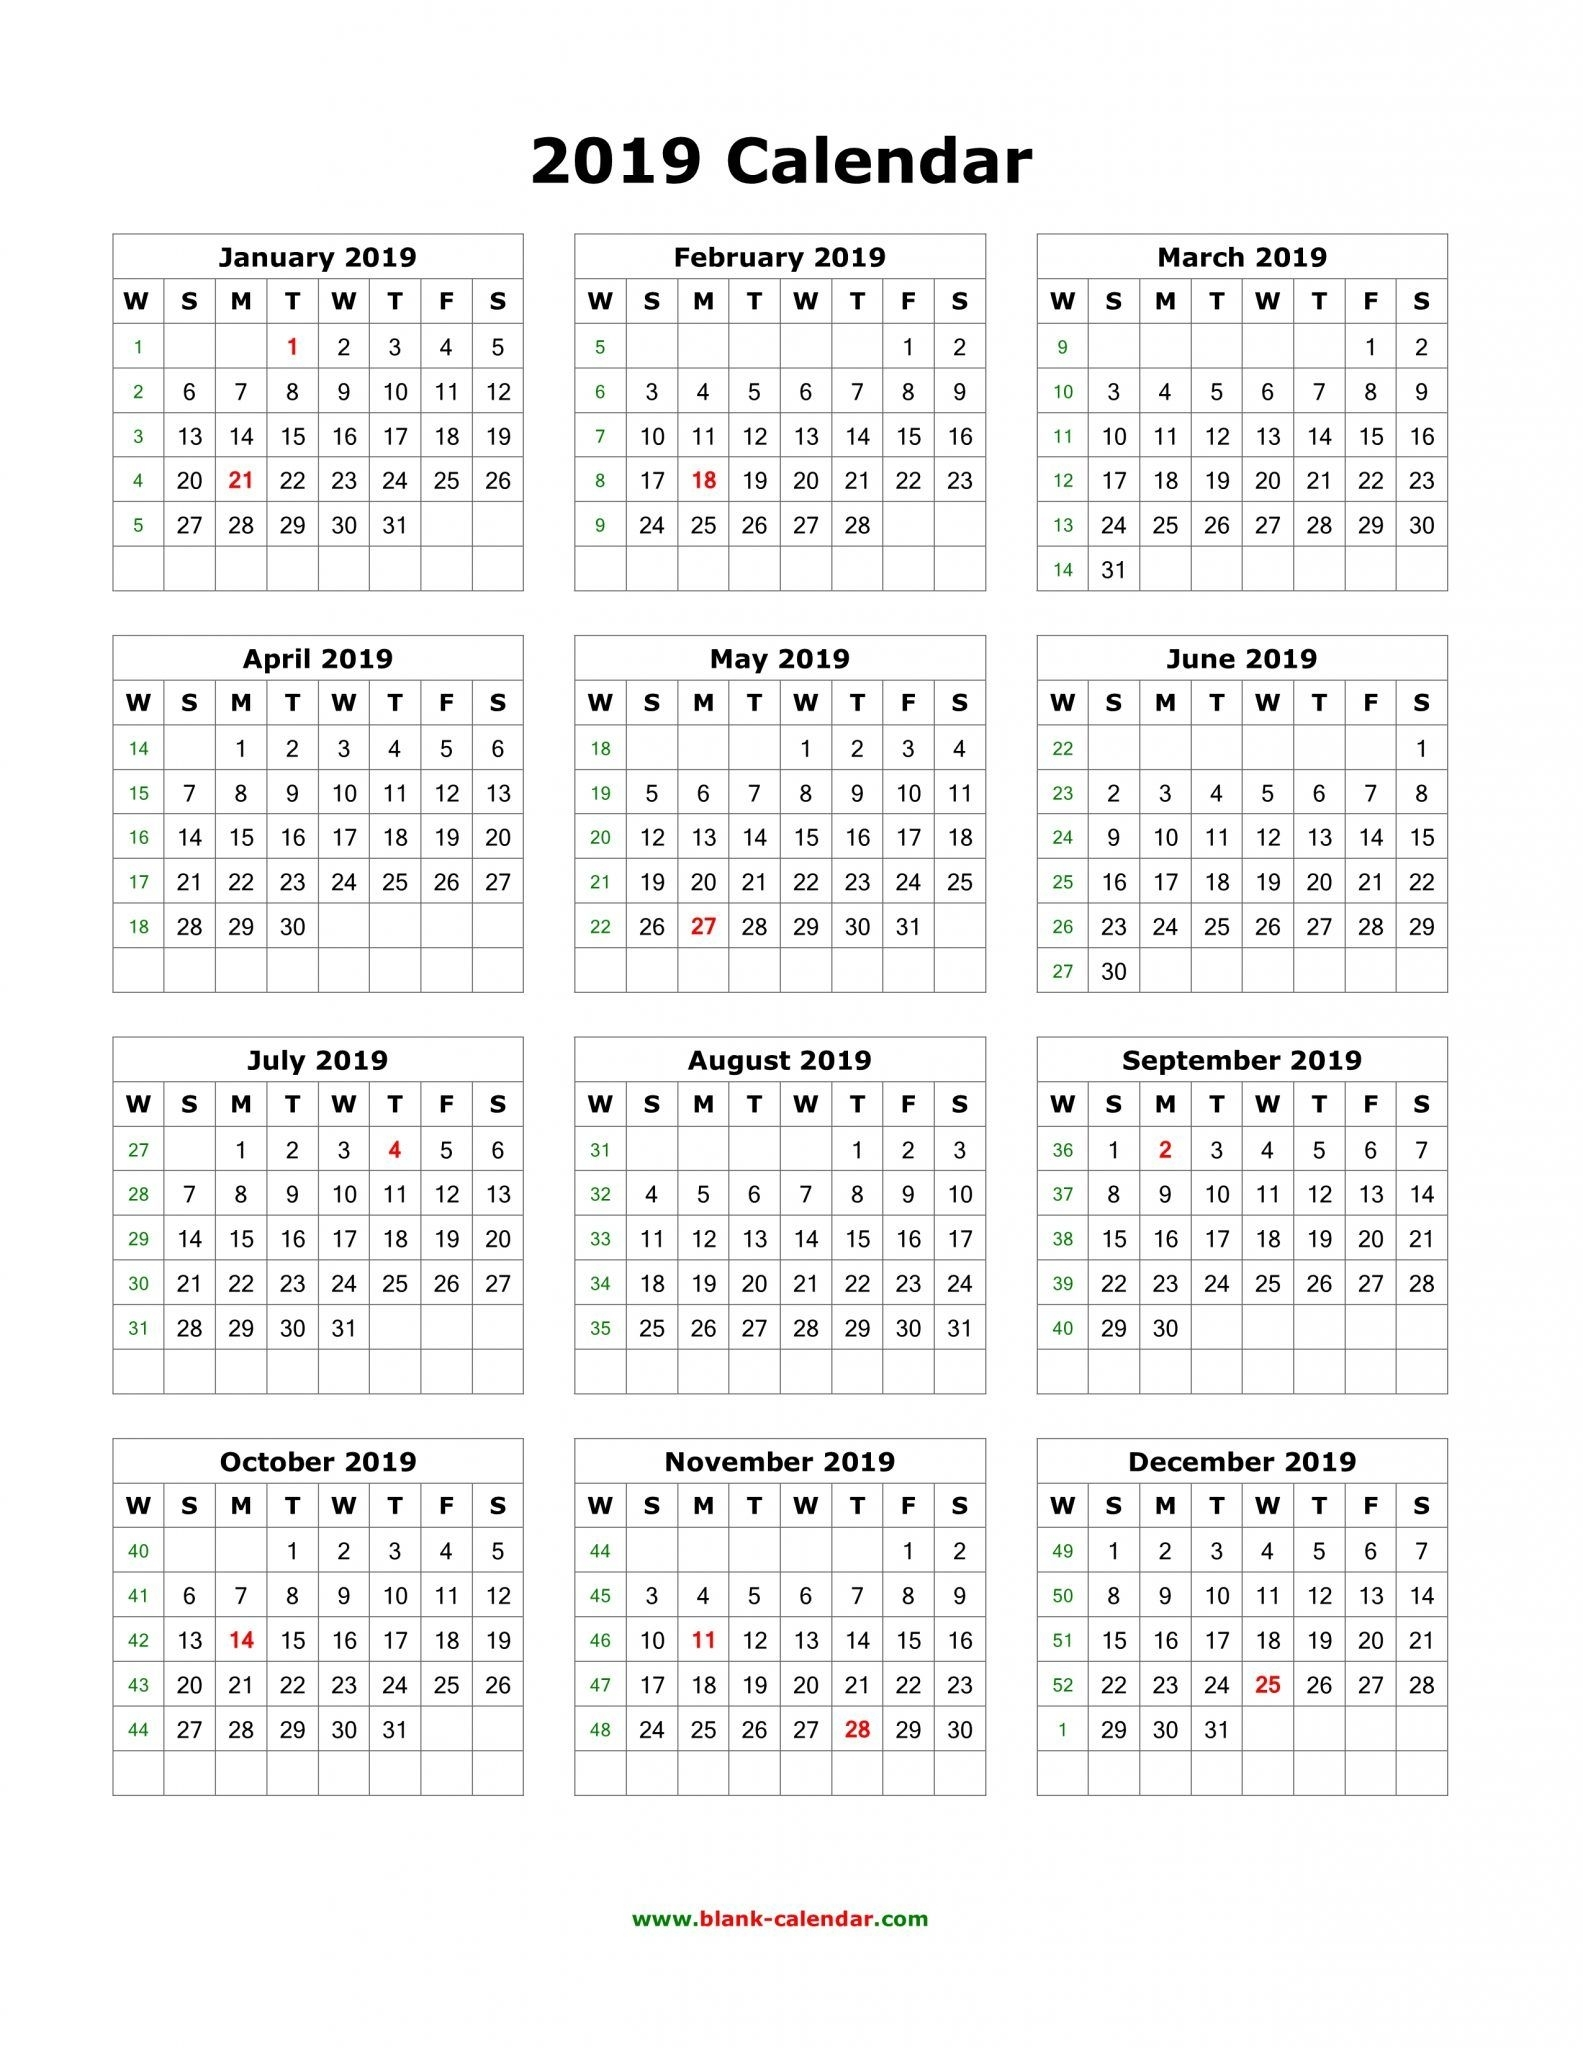 Download Blank 2019 Calendar Templates | 12 Month Calendar In One regarding 12 Month Blank Calendar Template